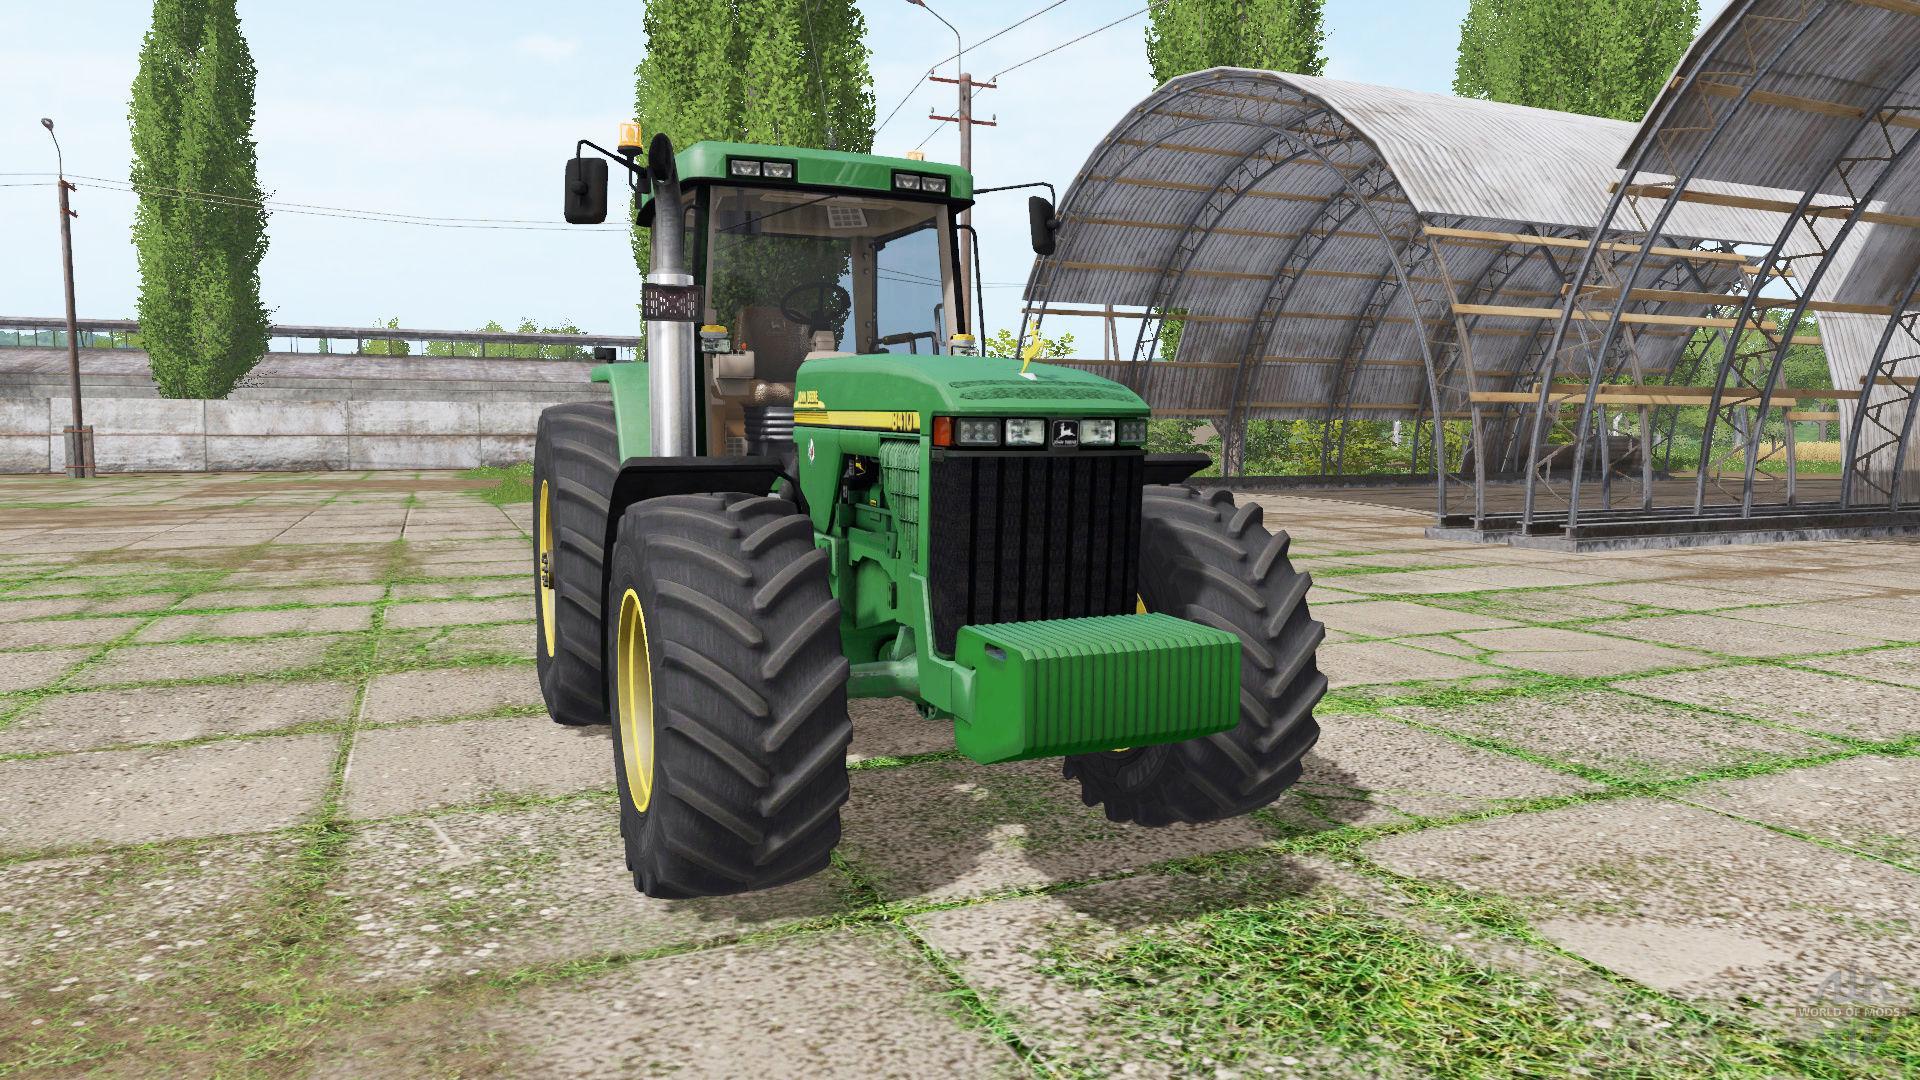 John Deere 8410 V3 3 6 9 Fs17 Farming Simulator 17 Mod